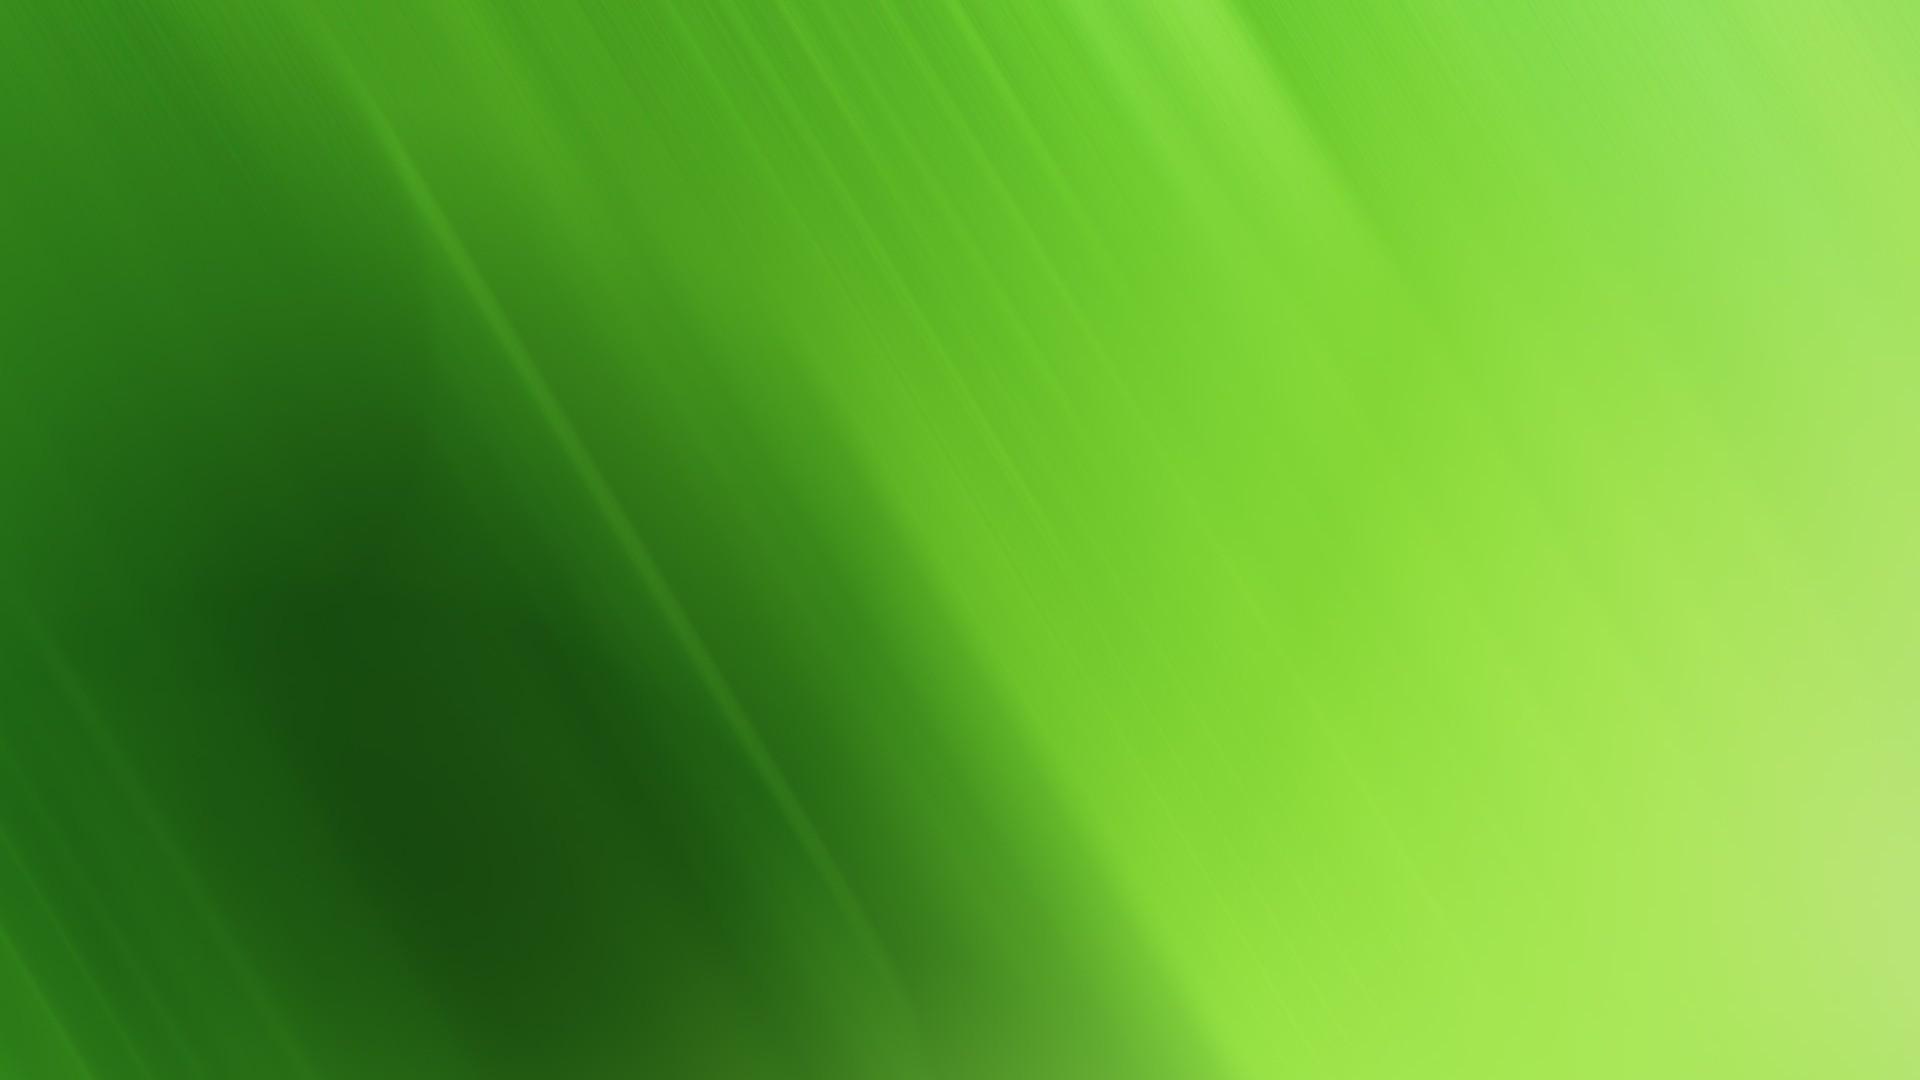 Spark Green wallpaper photo hd